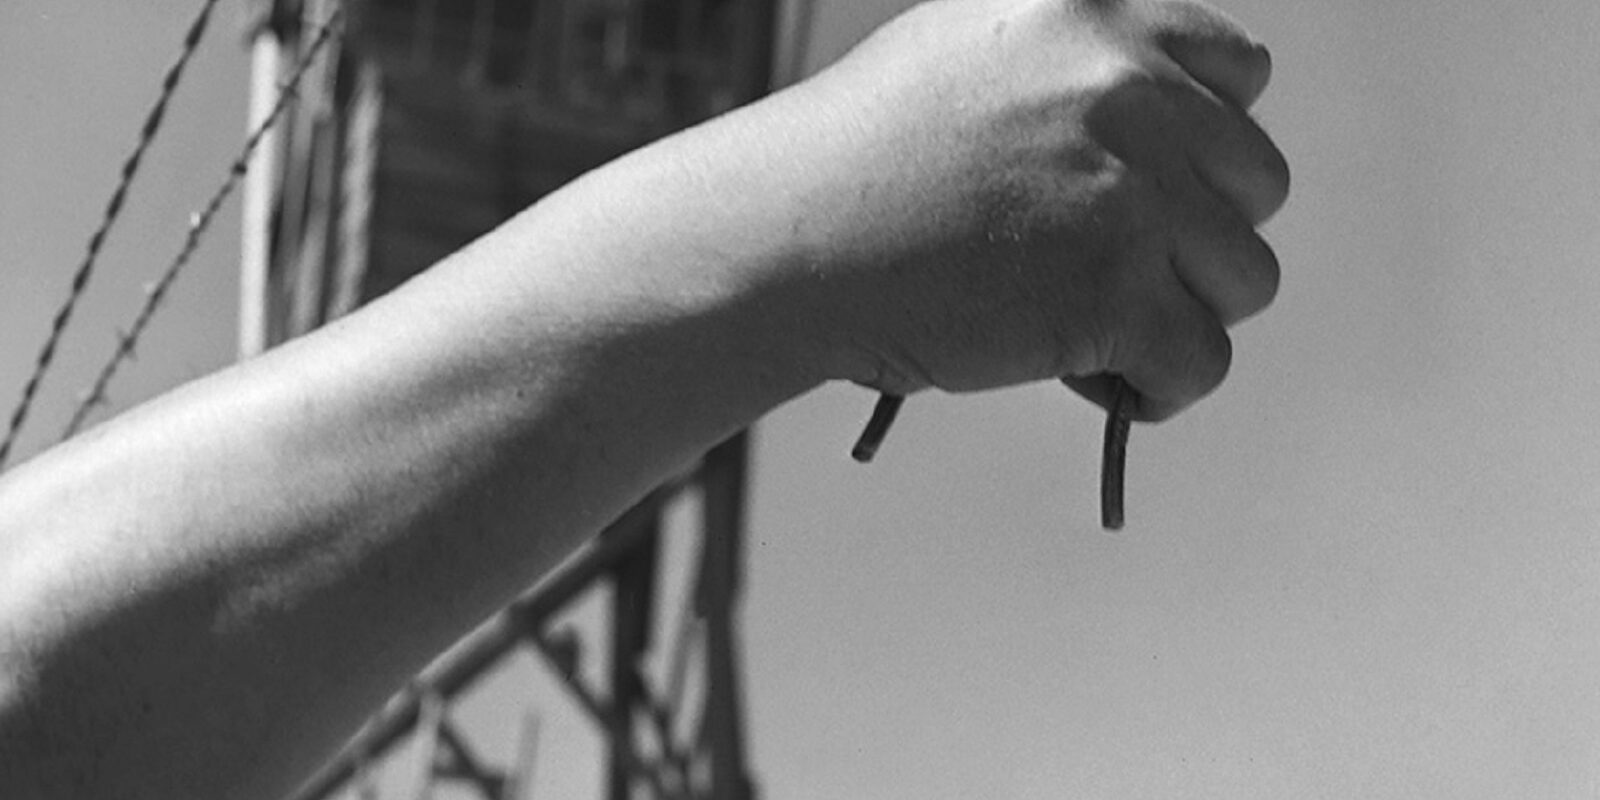 Wire Cutting Photograph Taken for the 1944 Manzanar High School Yearbok (1944)